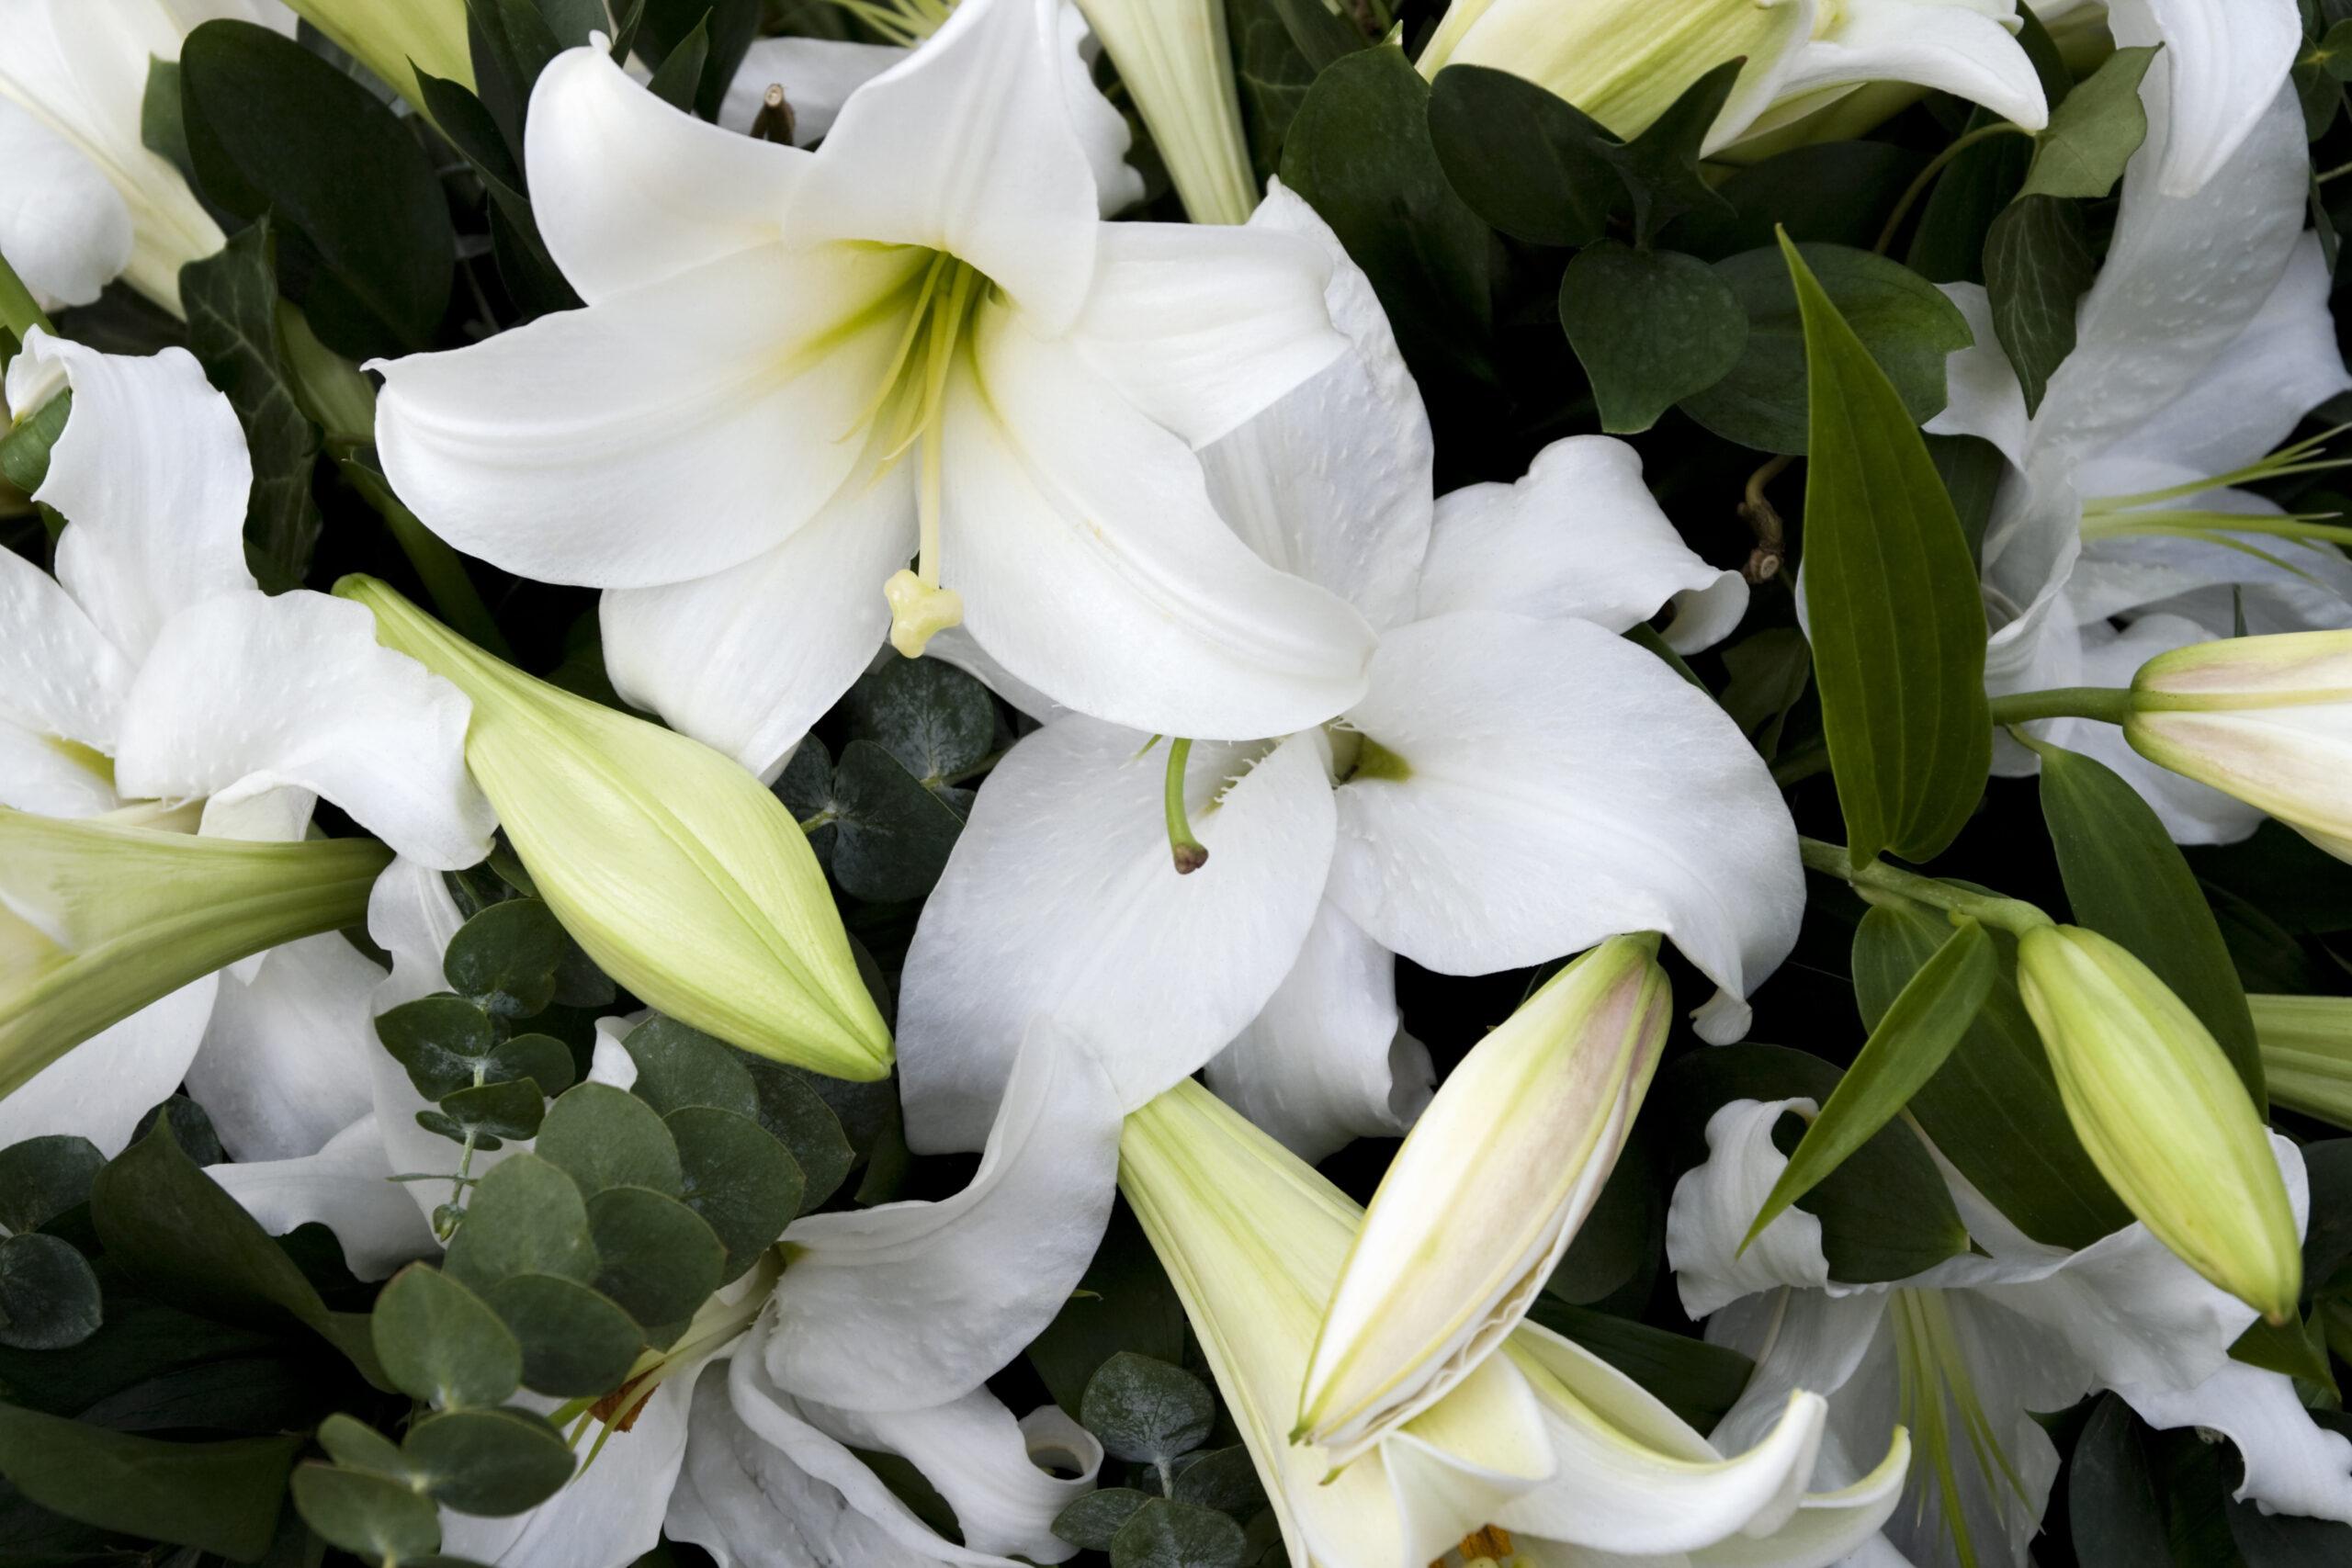 Longue maladie faciliter la préparation de ses propres obsèques - Odella.fr